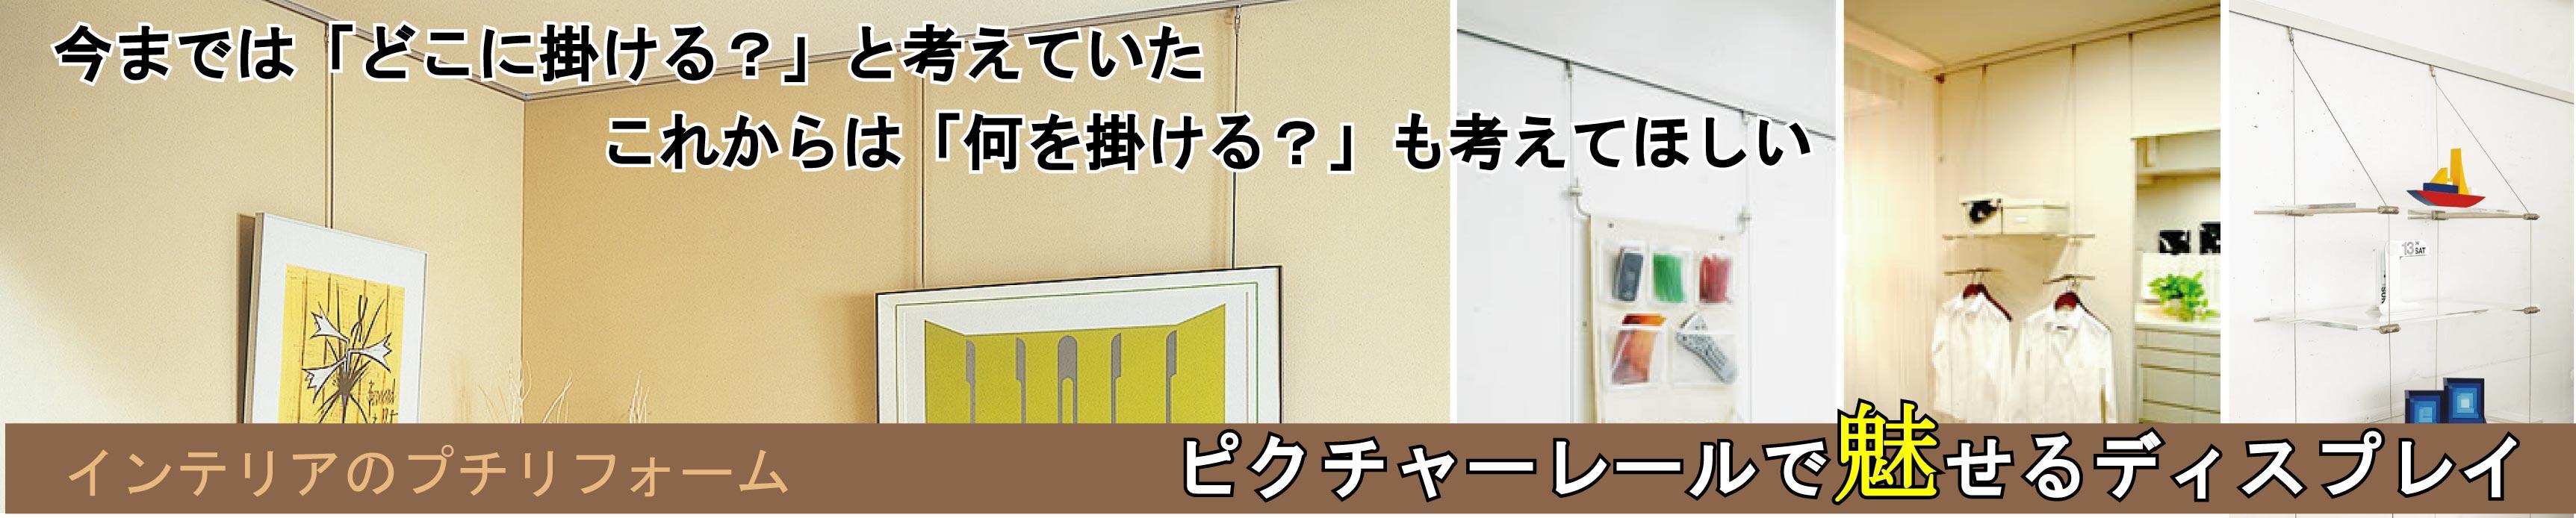 KuraSi-natu-sin77-07.jpg